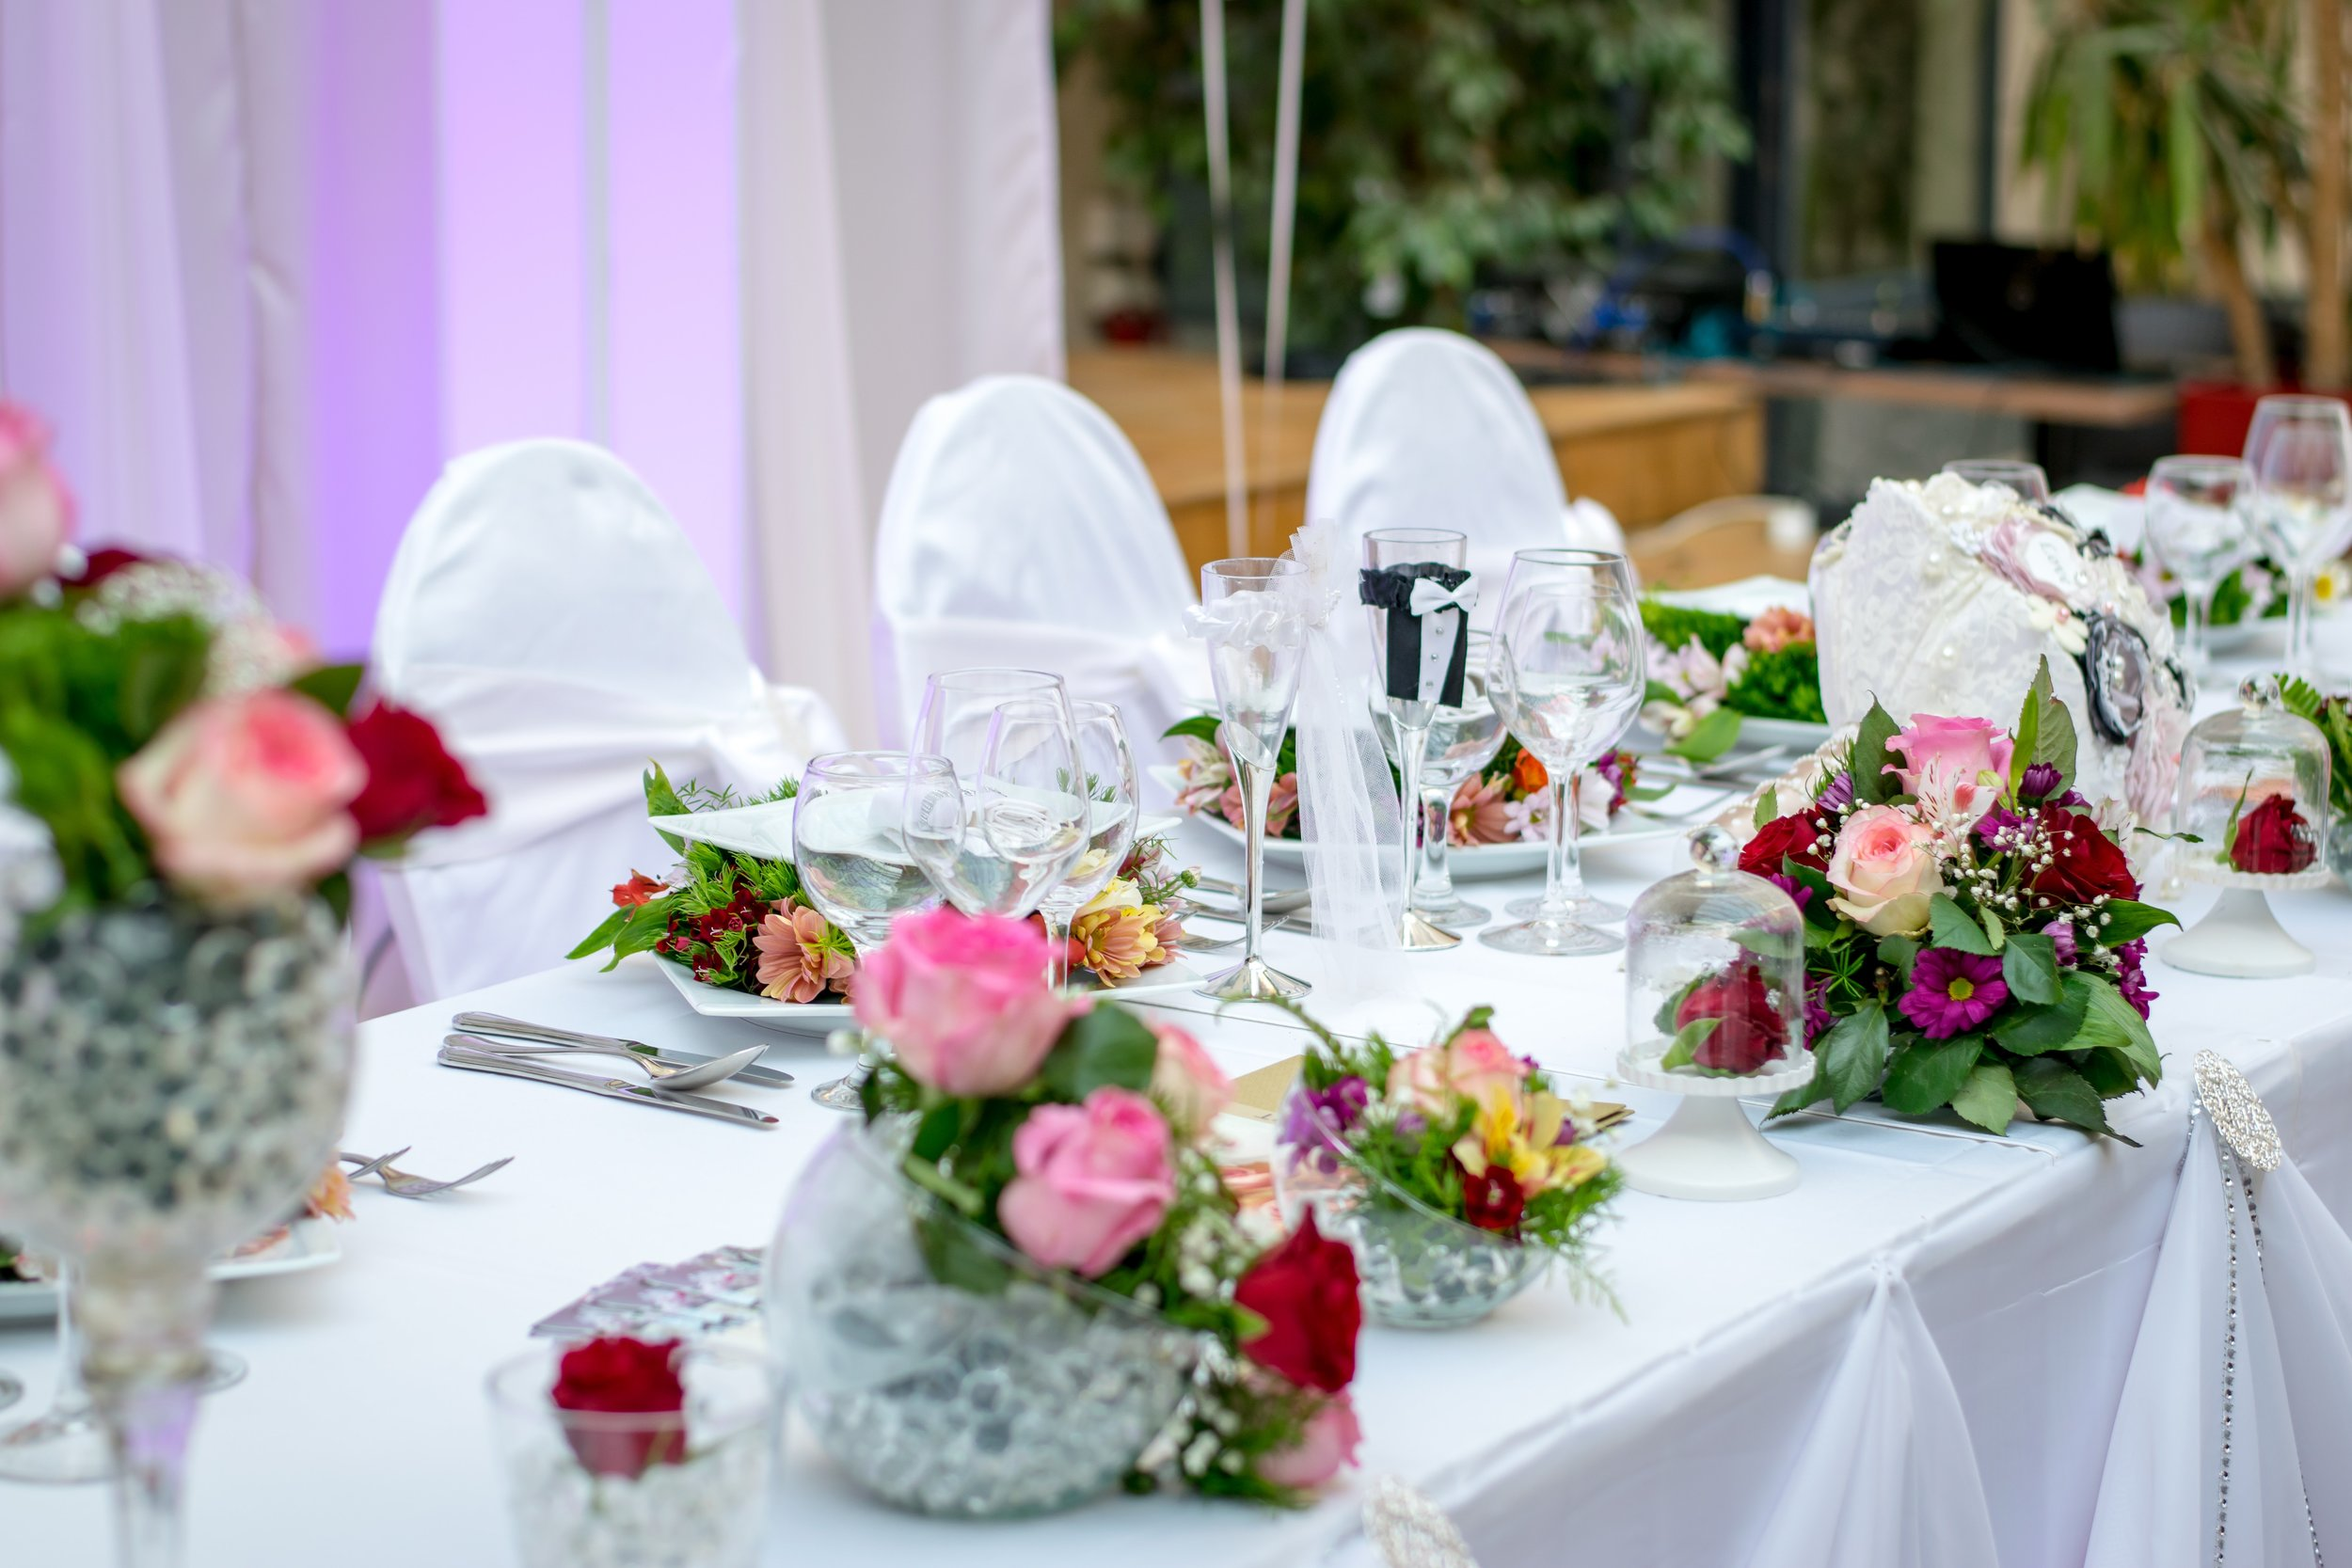 catering-decoration-dinner-57980.jpg